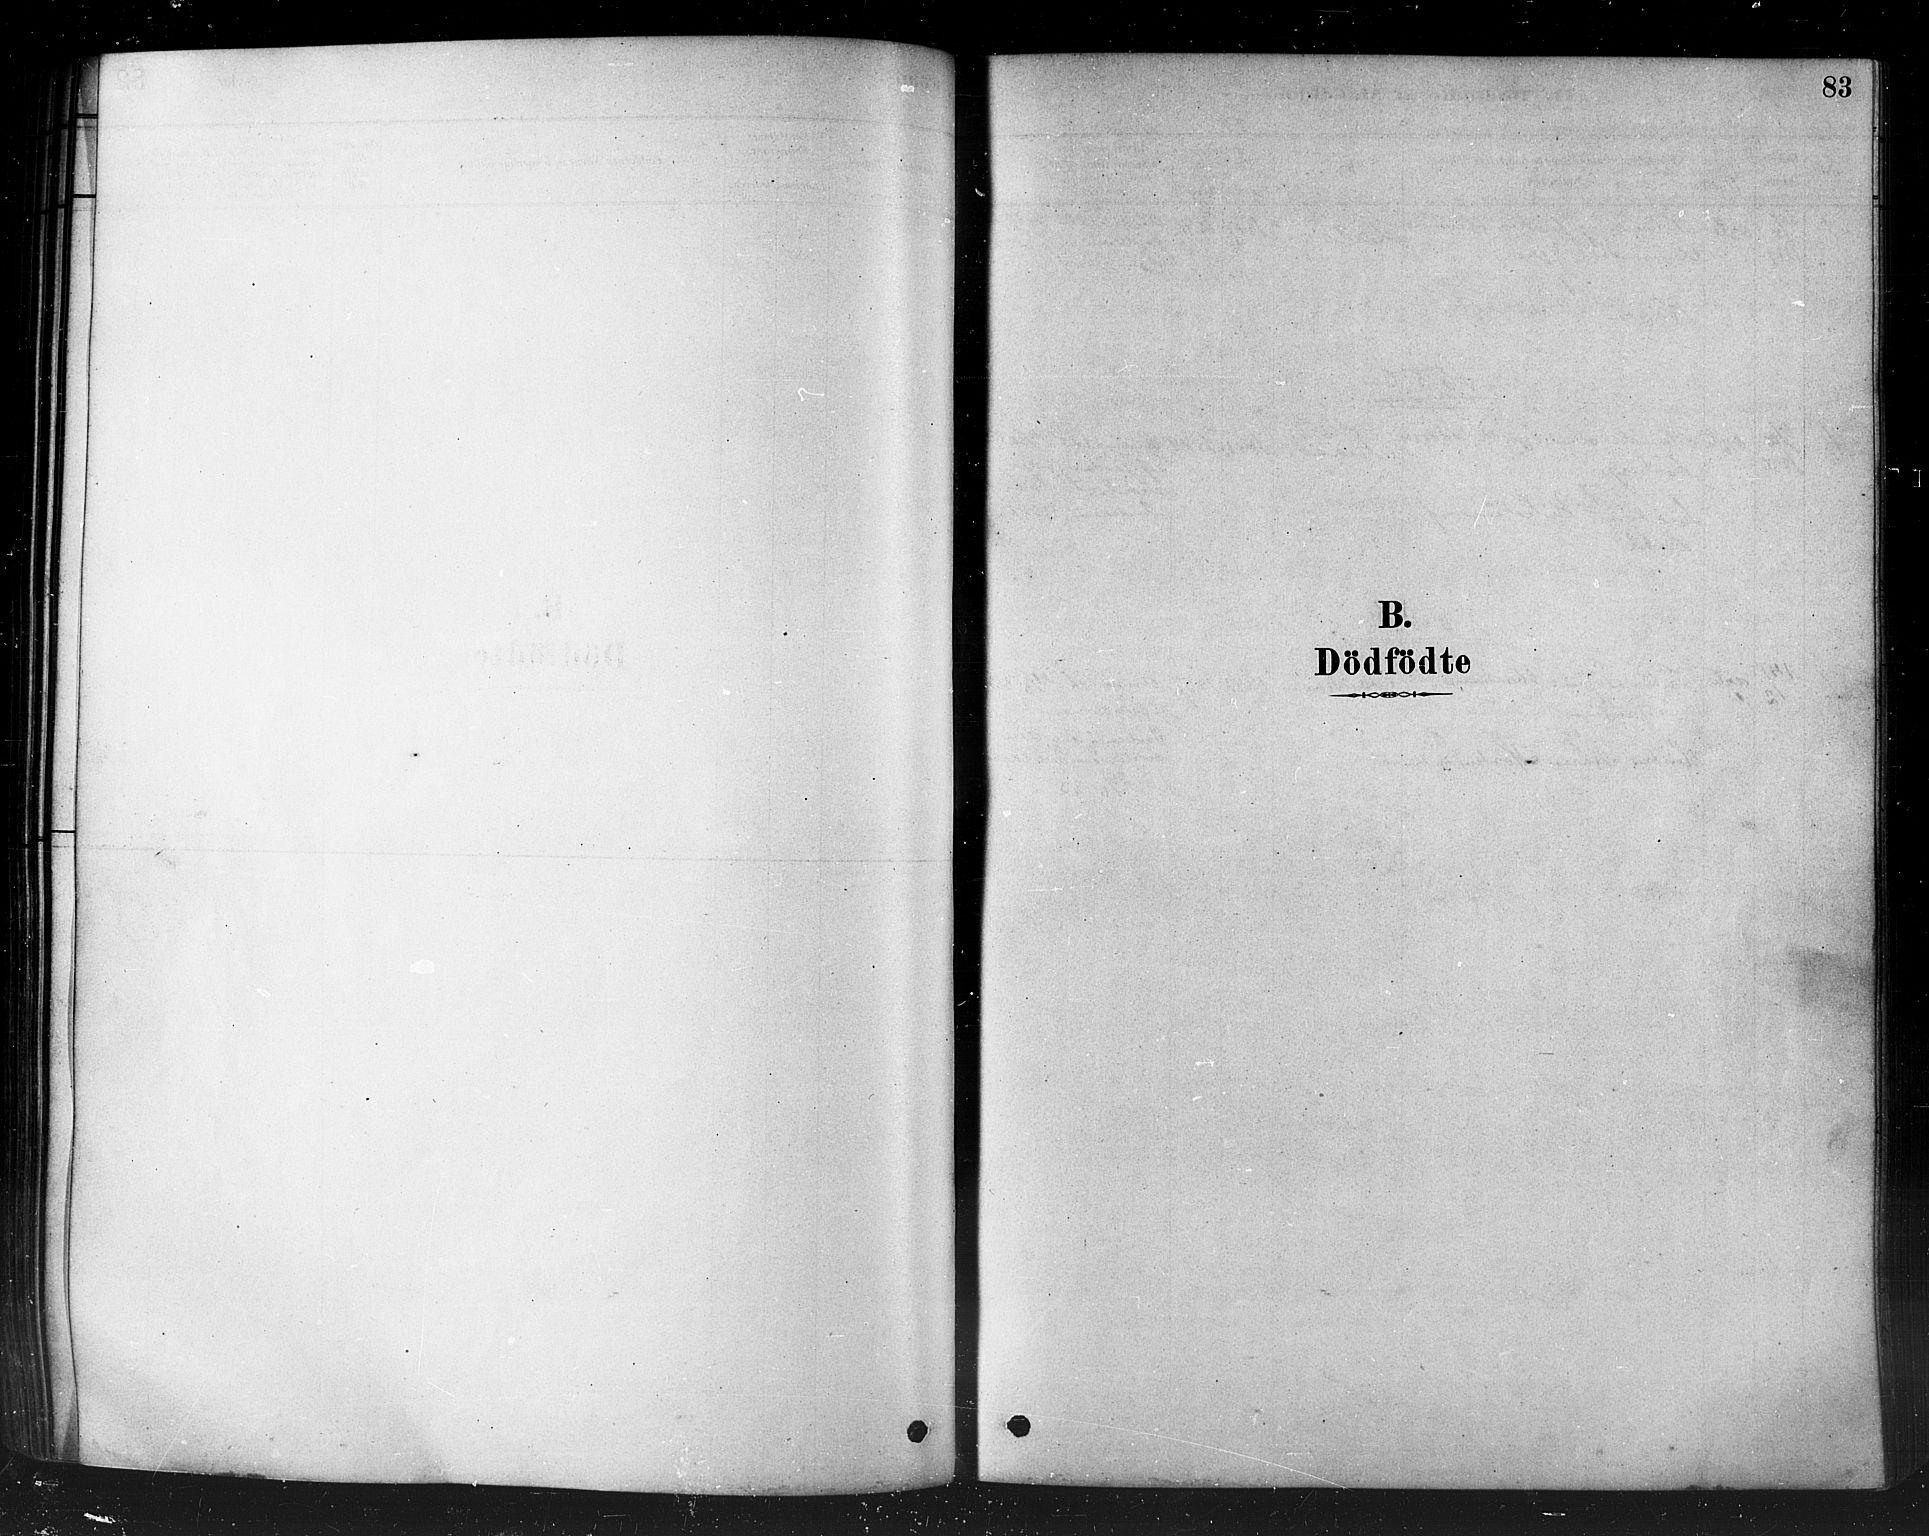 SATØ, Måsøy sokneprestkontor, H/Ha/L0004kirke: Ministerialbok nr. 4, 1878-1891, s. 83